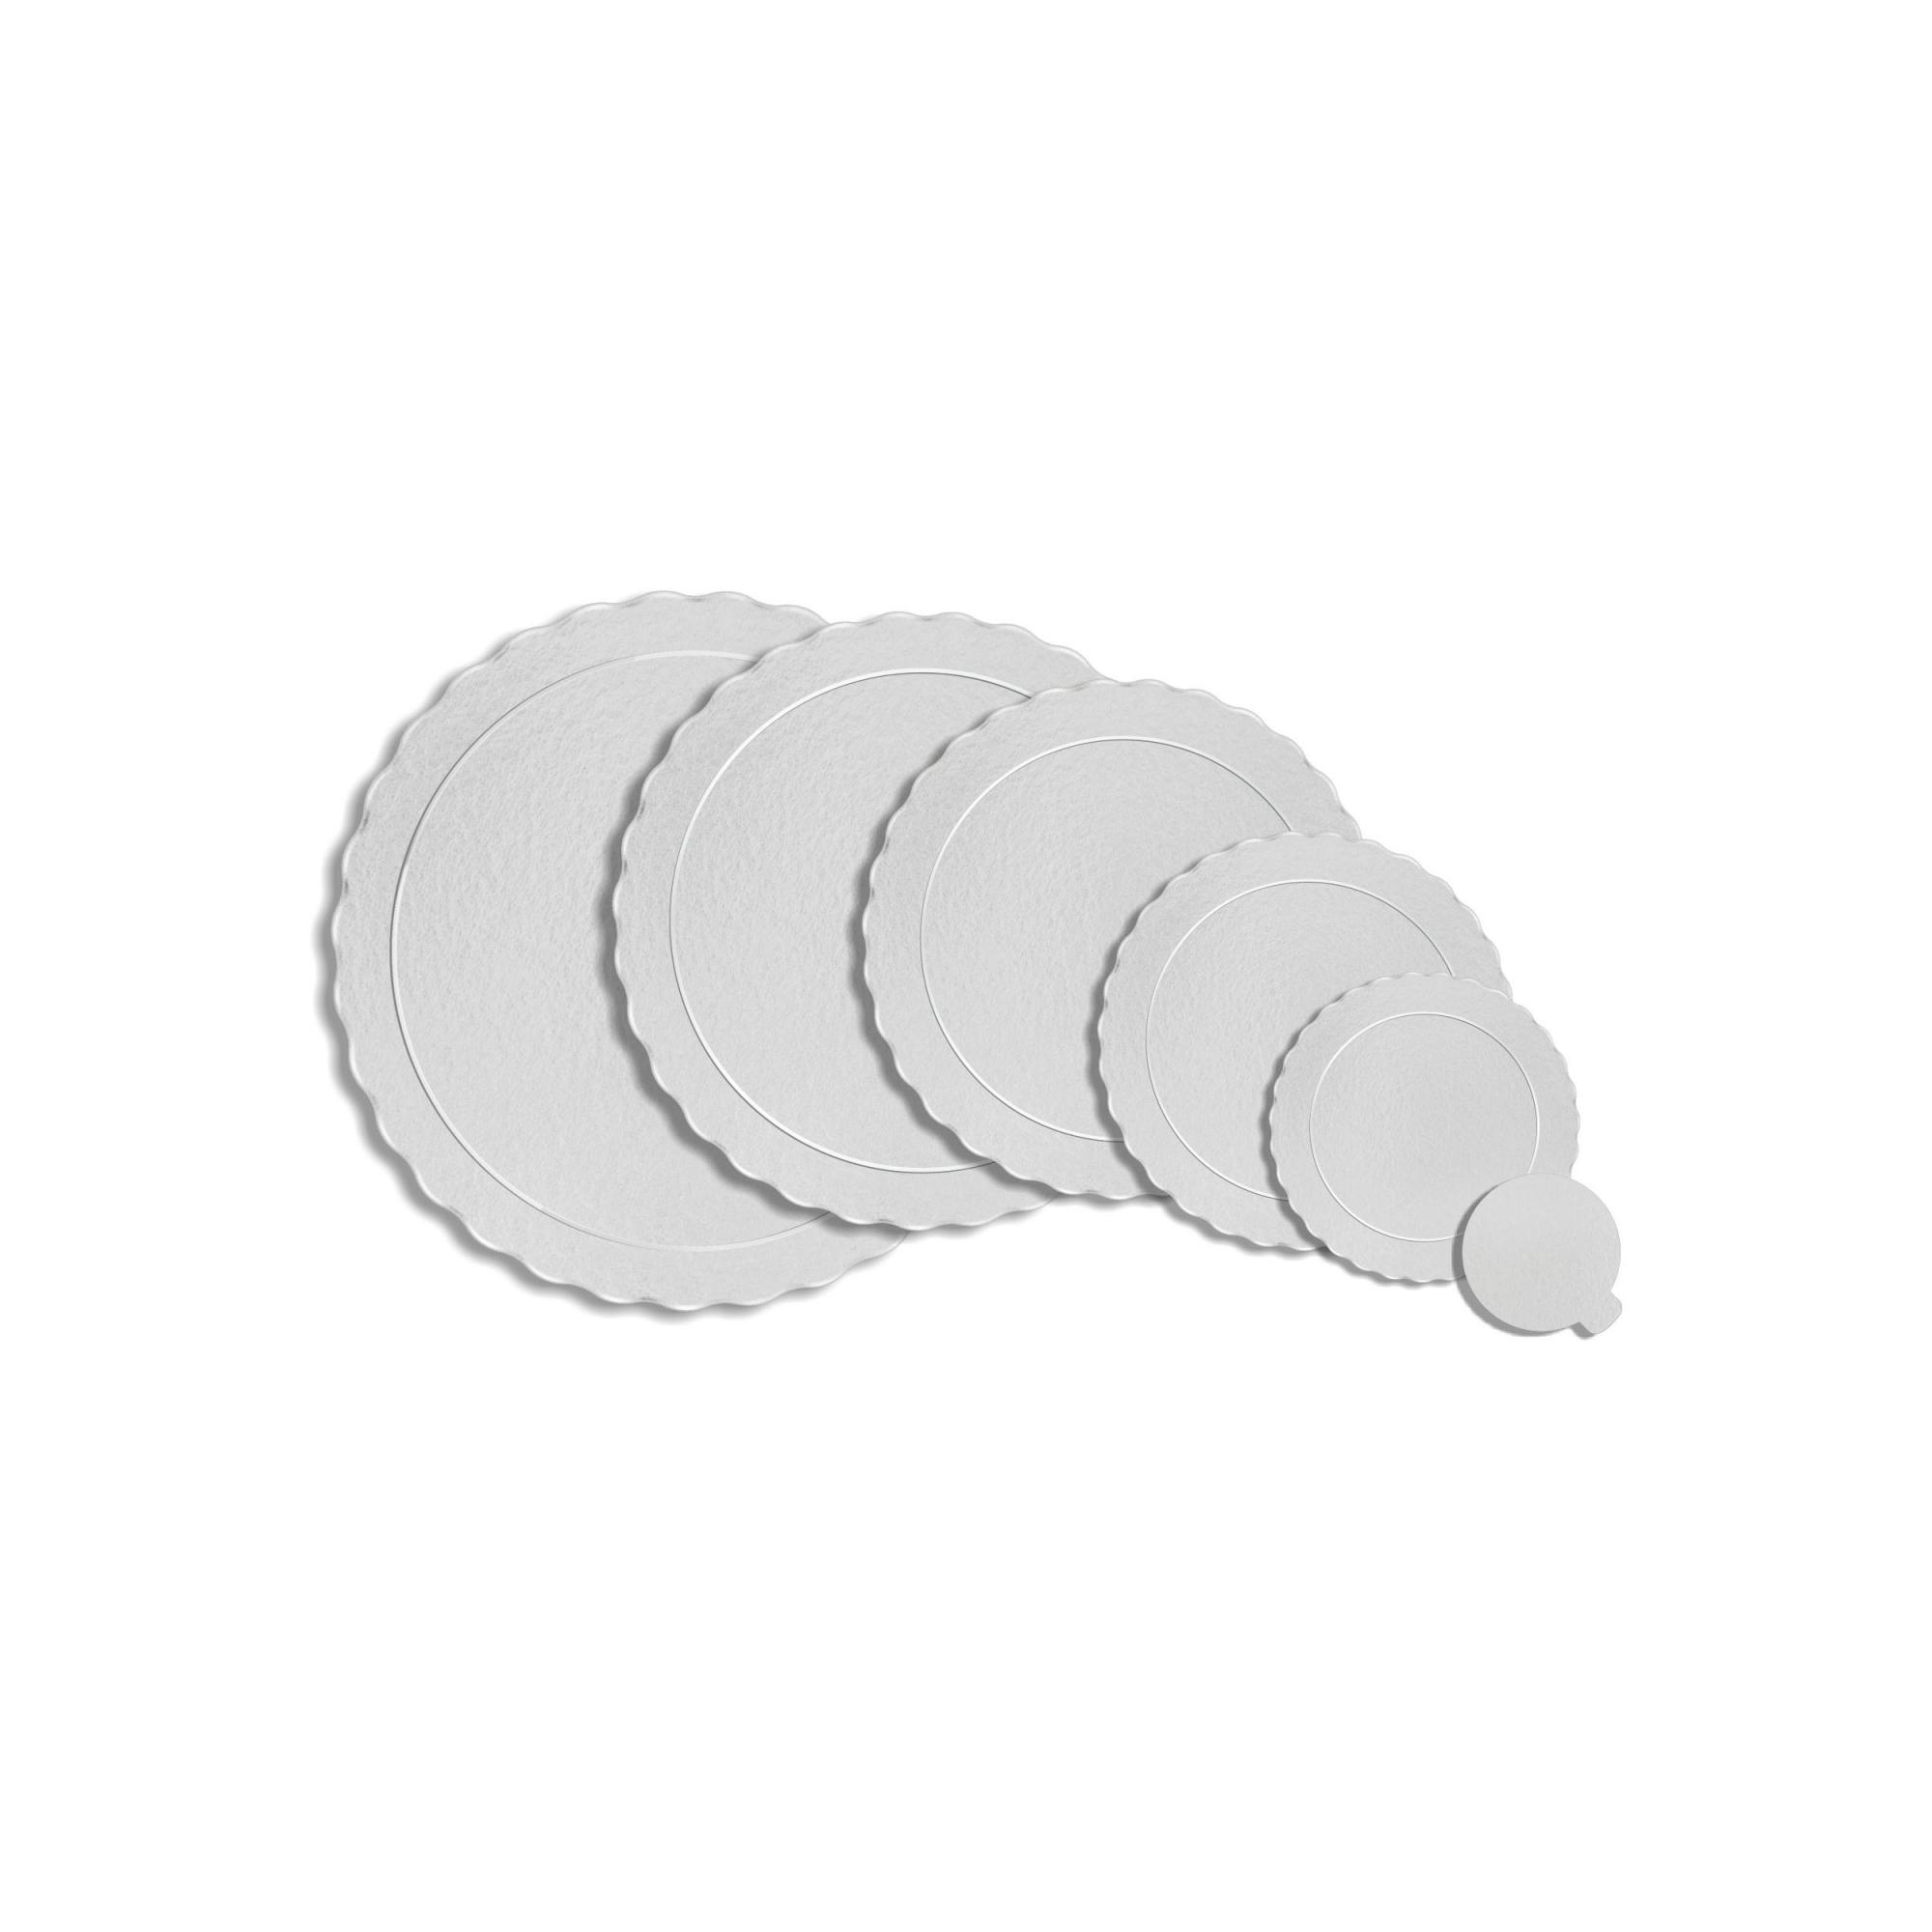 100 Bases Laminadas, Suporte P/ Bolo, Cake Board, Kit 25 e 28 cm - Branco